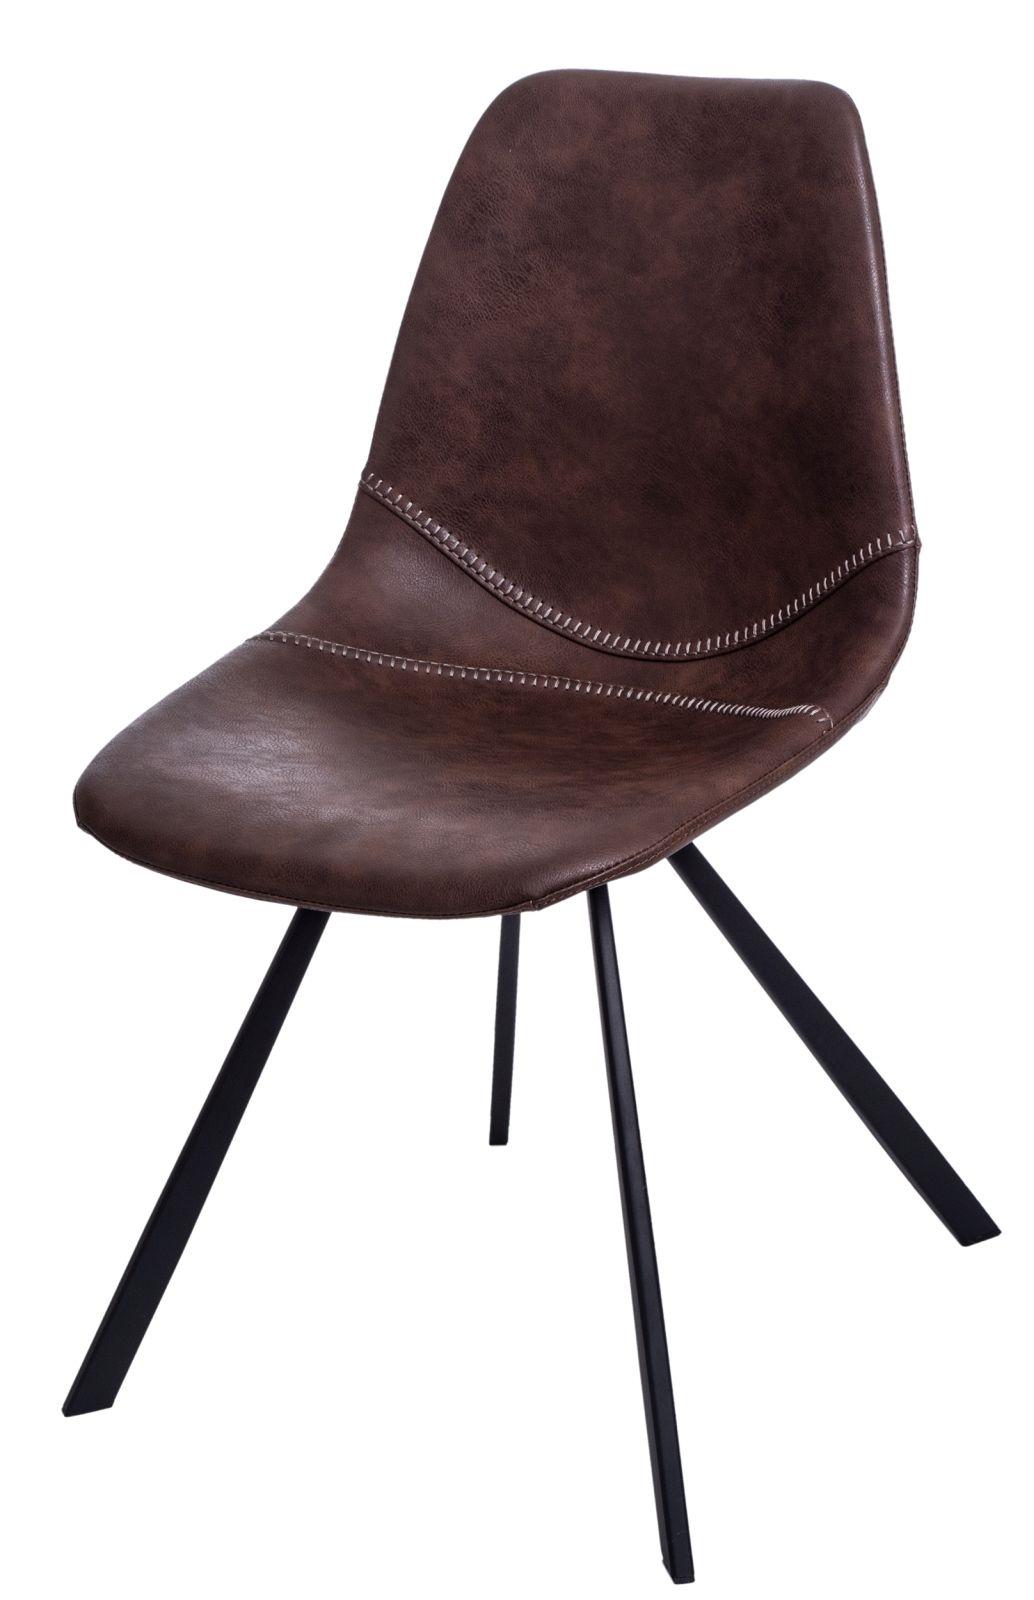 Stoličky Vincent M svetlá hnedá